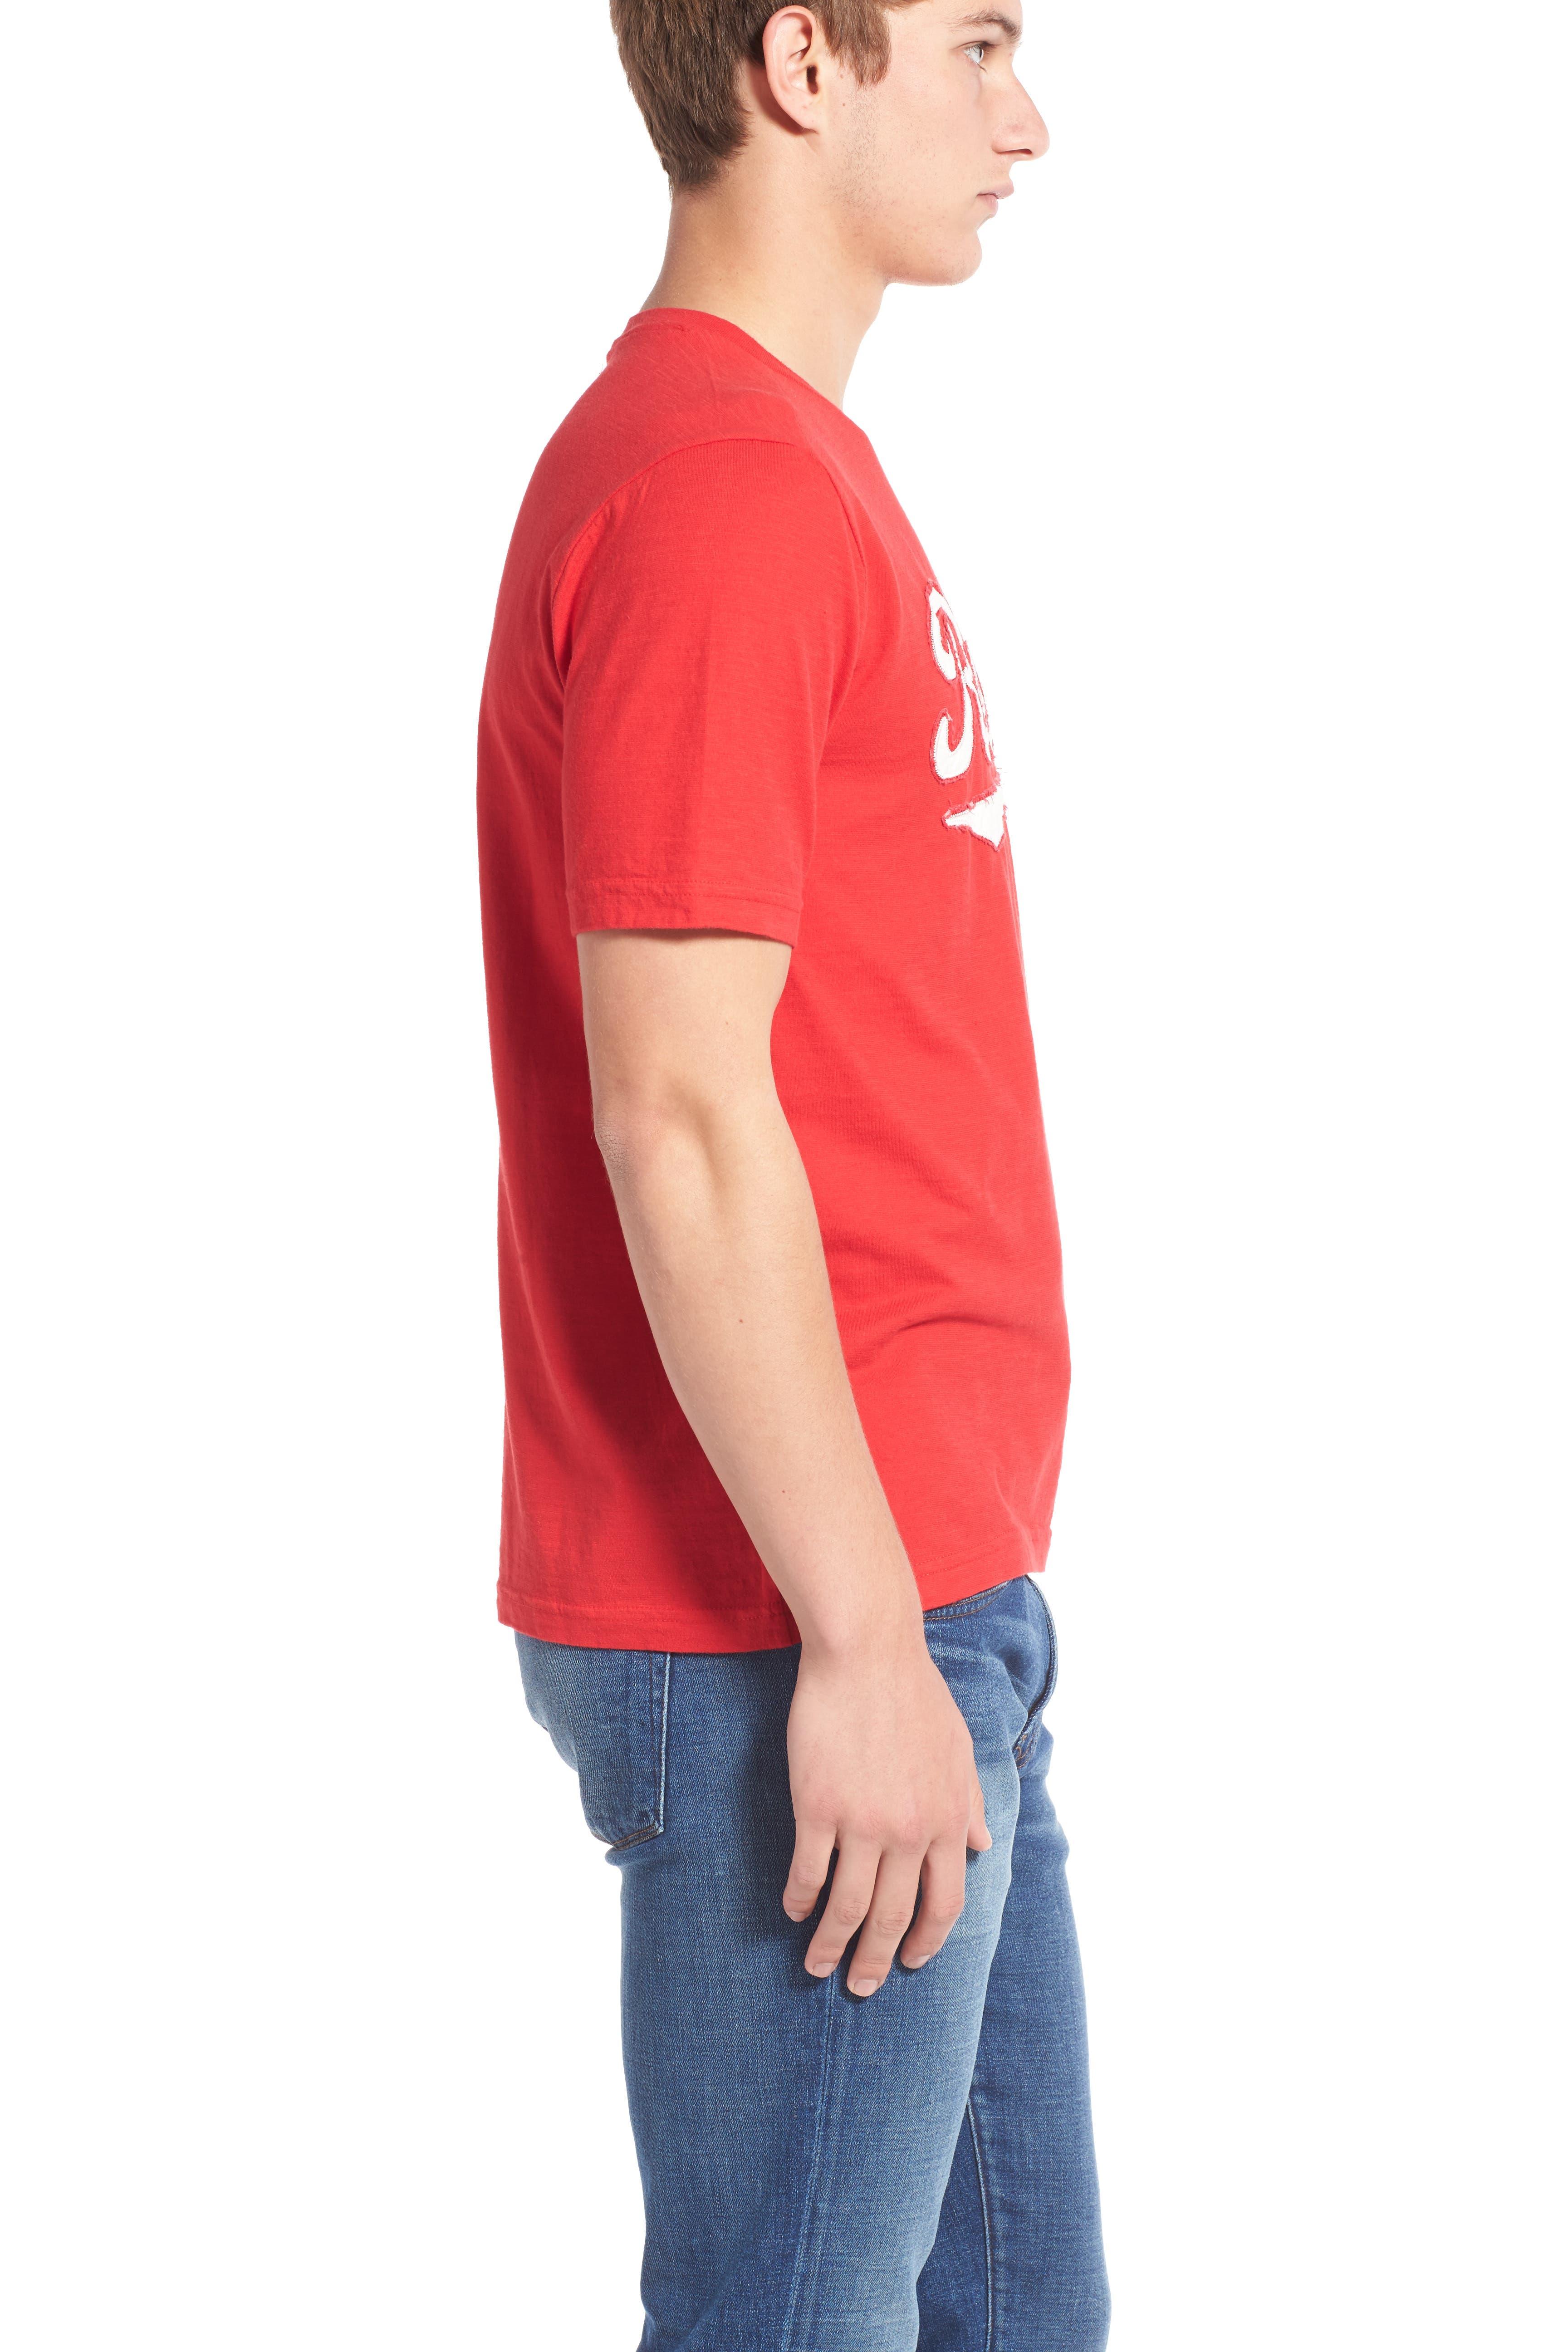 'Cincinnati Reds - Twofold' Crewneck T-Shirt,                             Alternate thumbnail 4, color,                             600